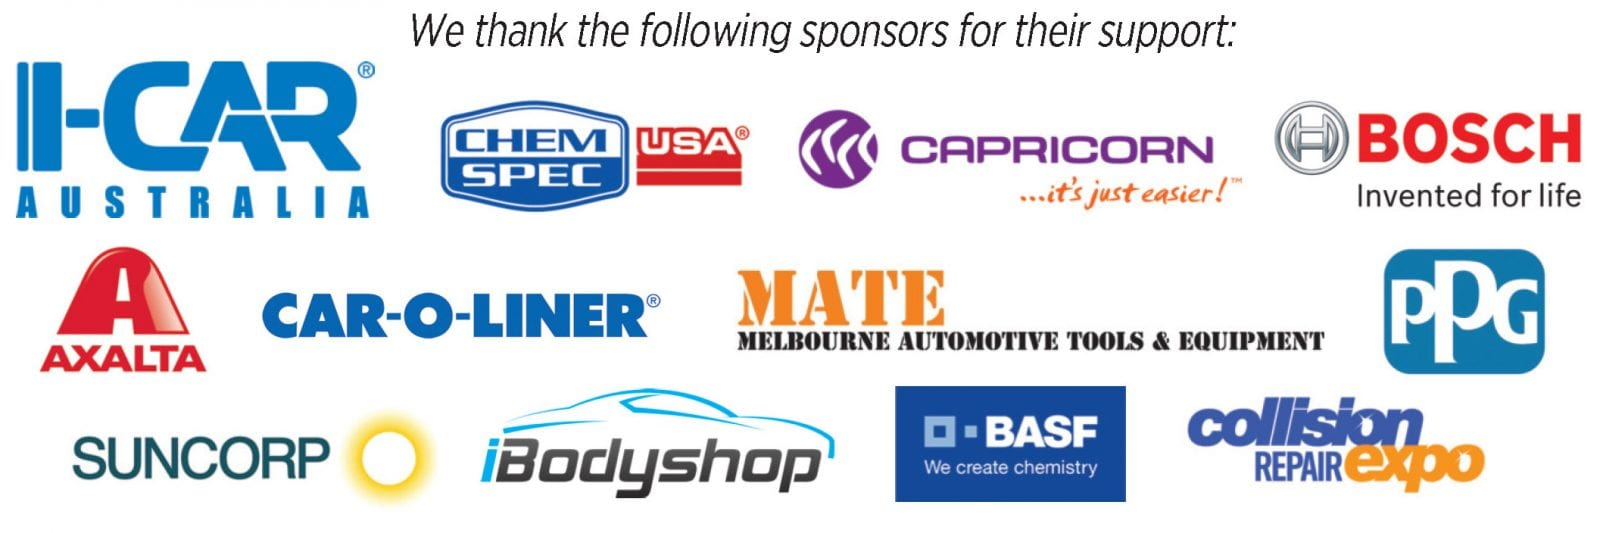 NCR Symposium sponsors